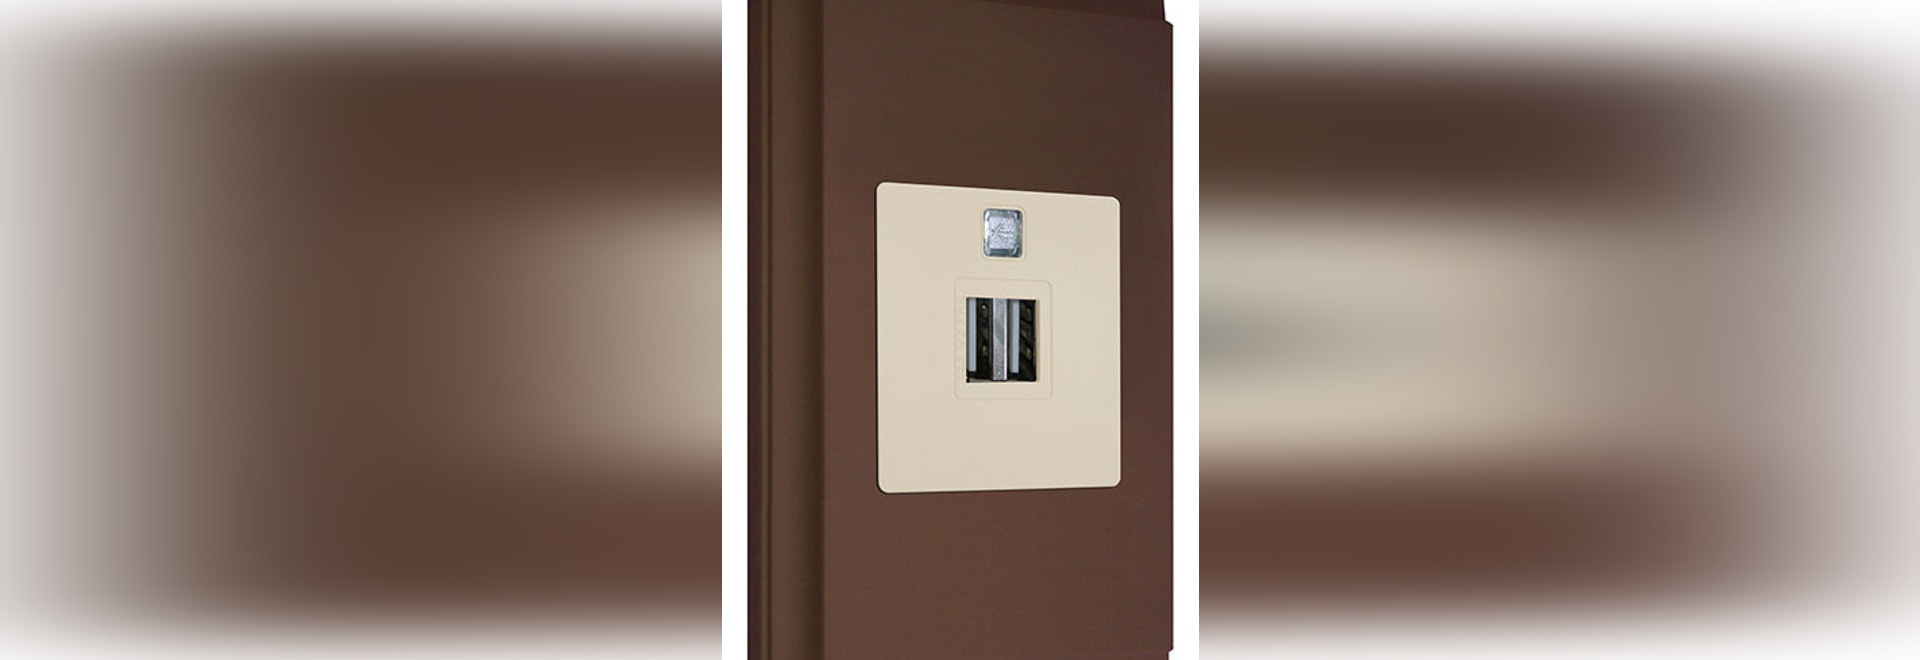 NEW: USB socket by FEDE